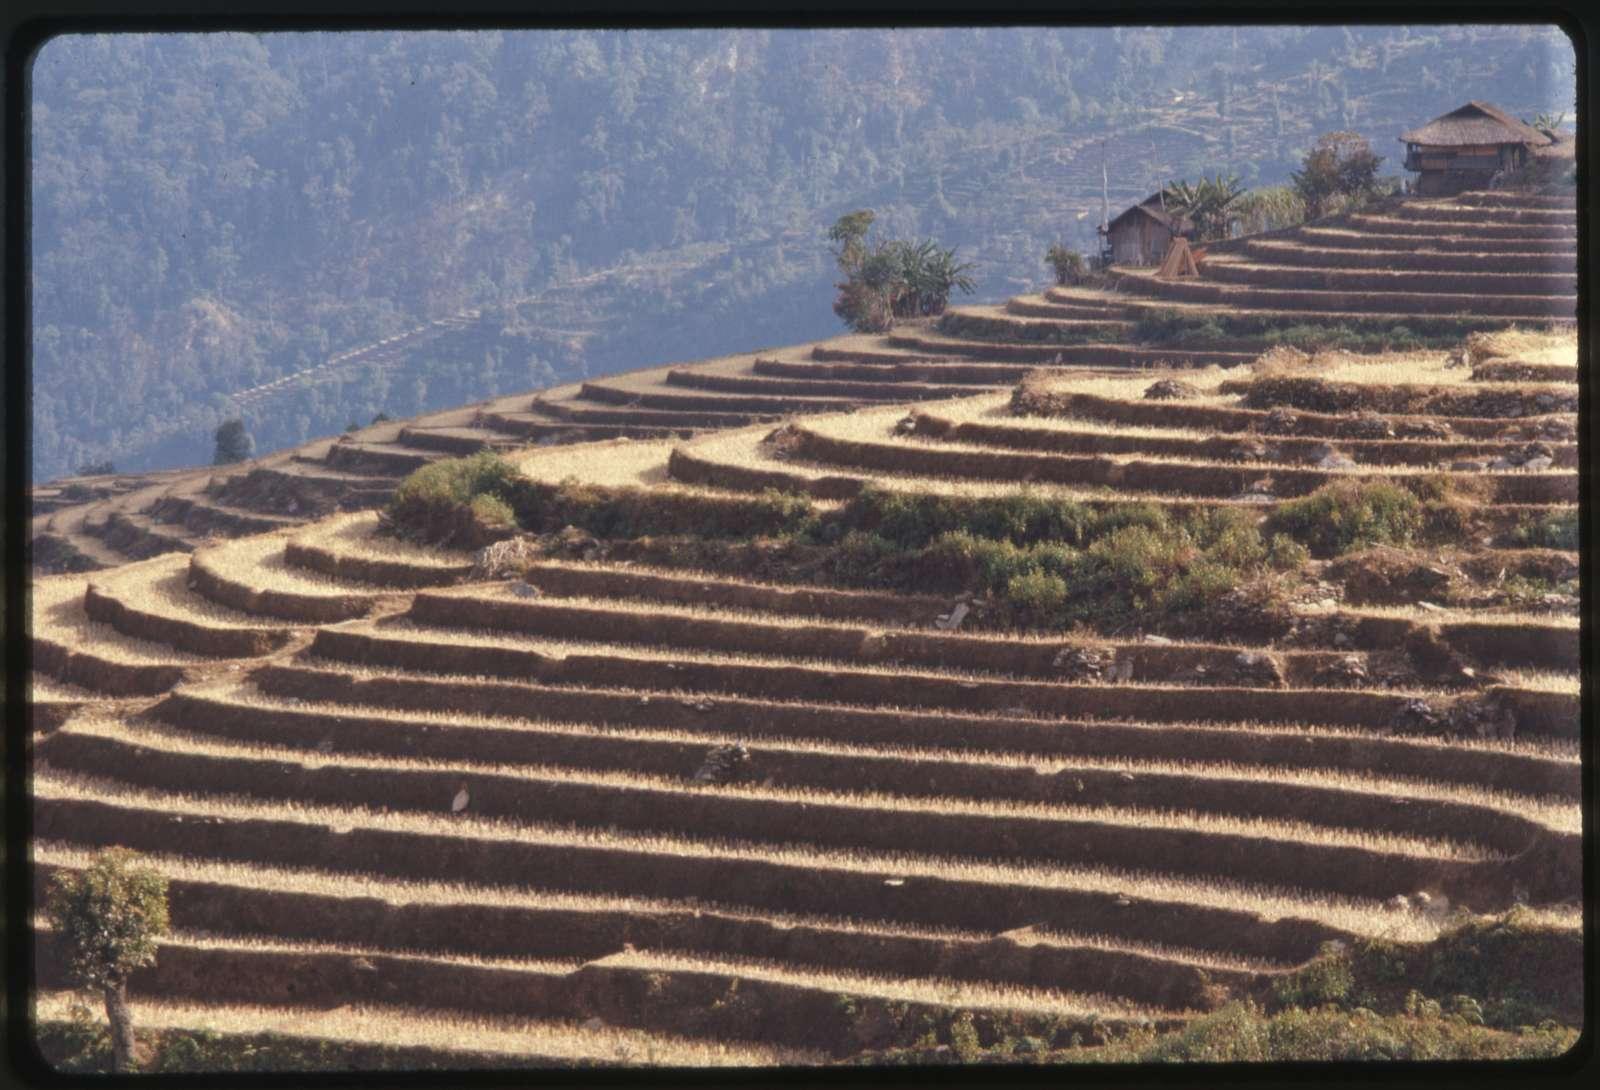 Sikkim, dry season, rice terraces